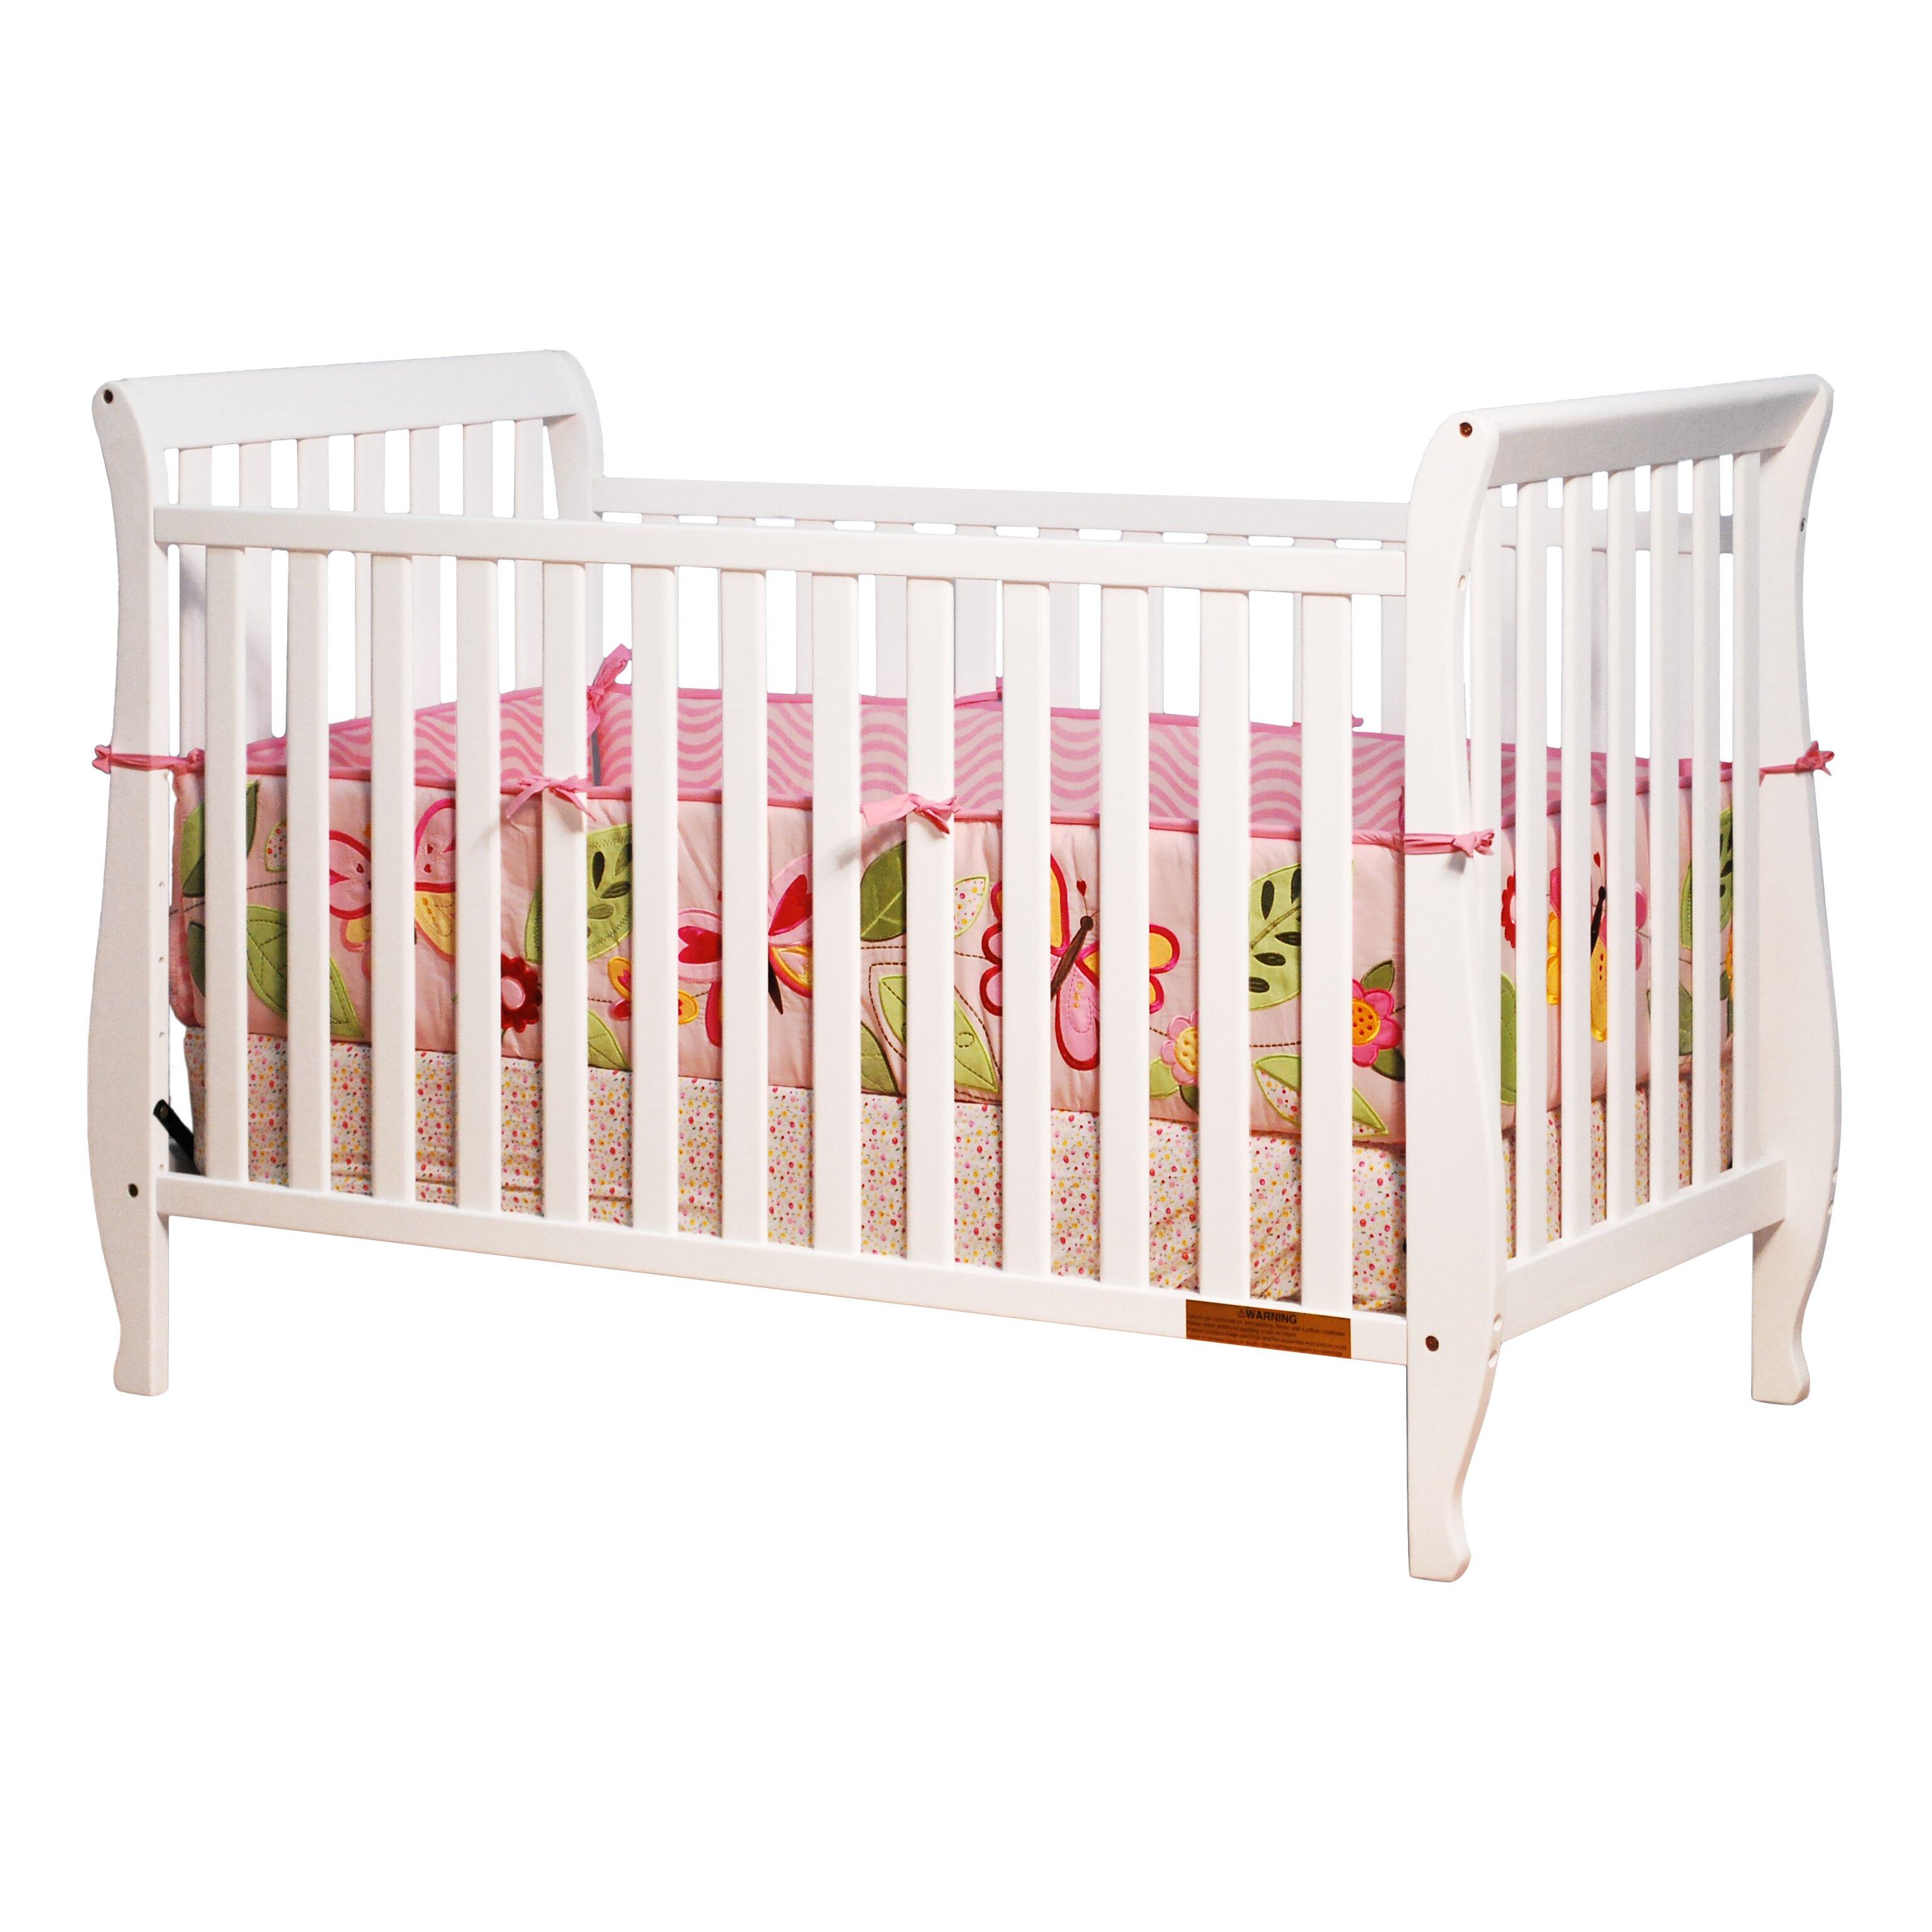 Bayb Page 275 Baby Crib Wood Light Gray Crib Baby Wooden Crib